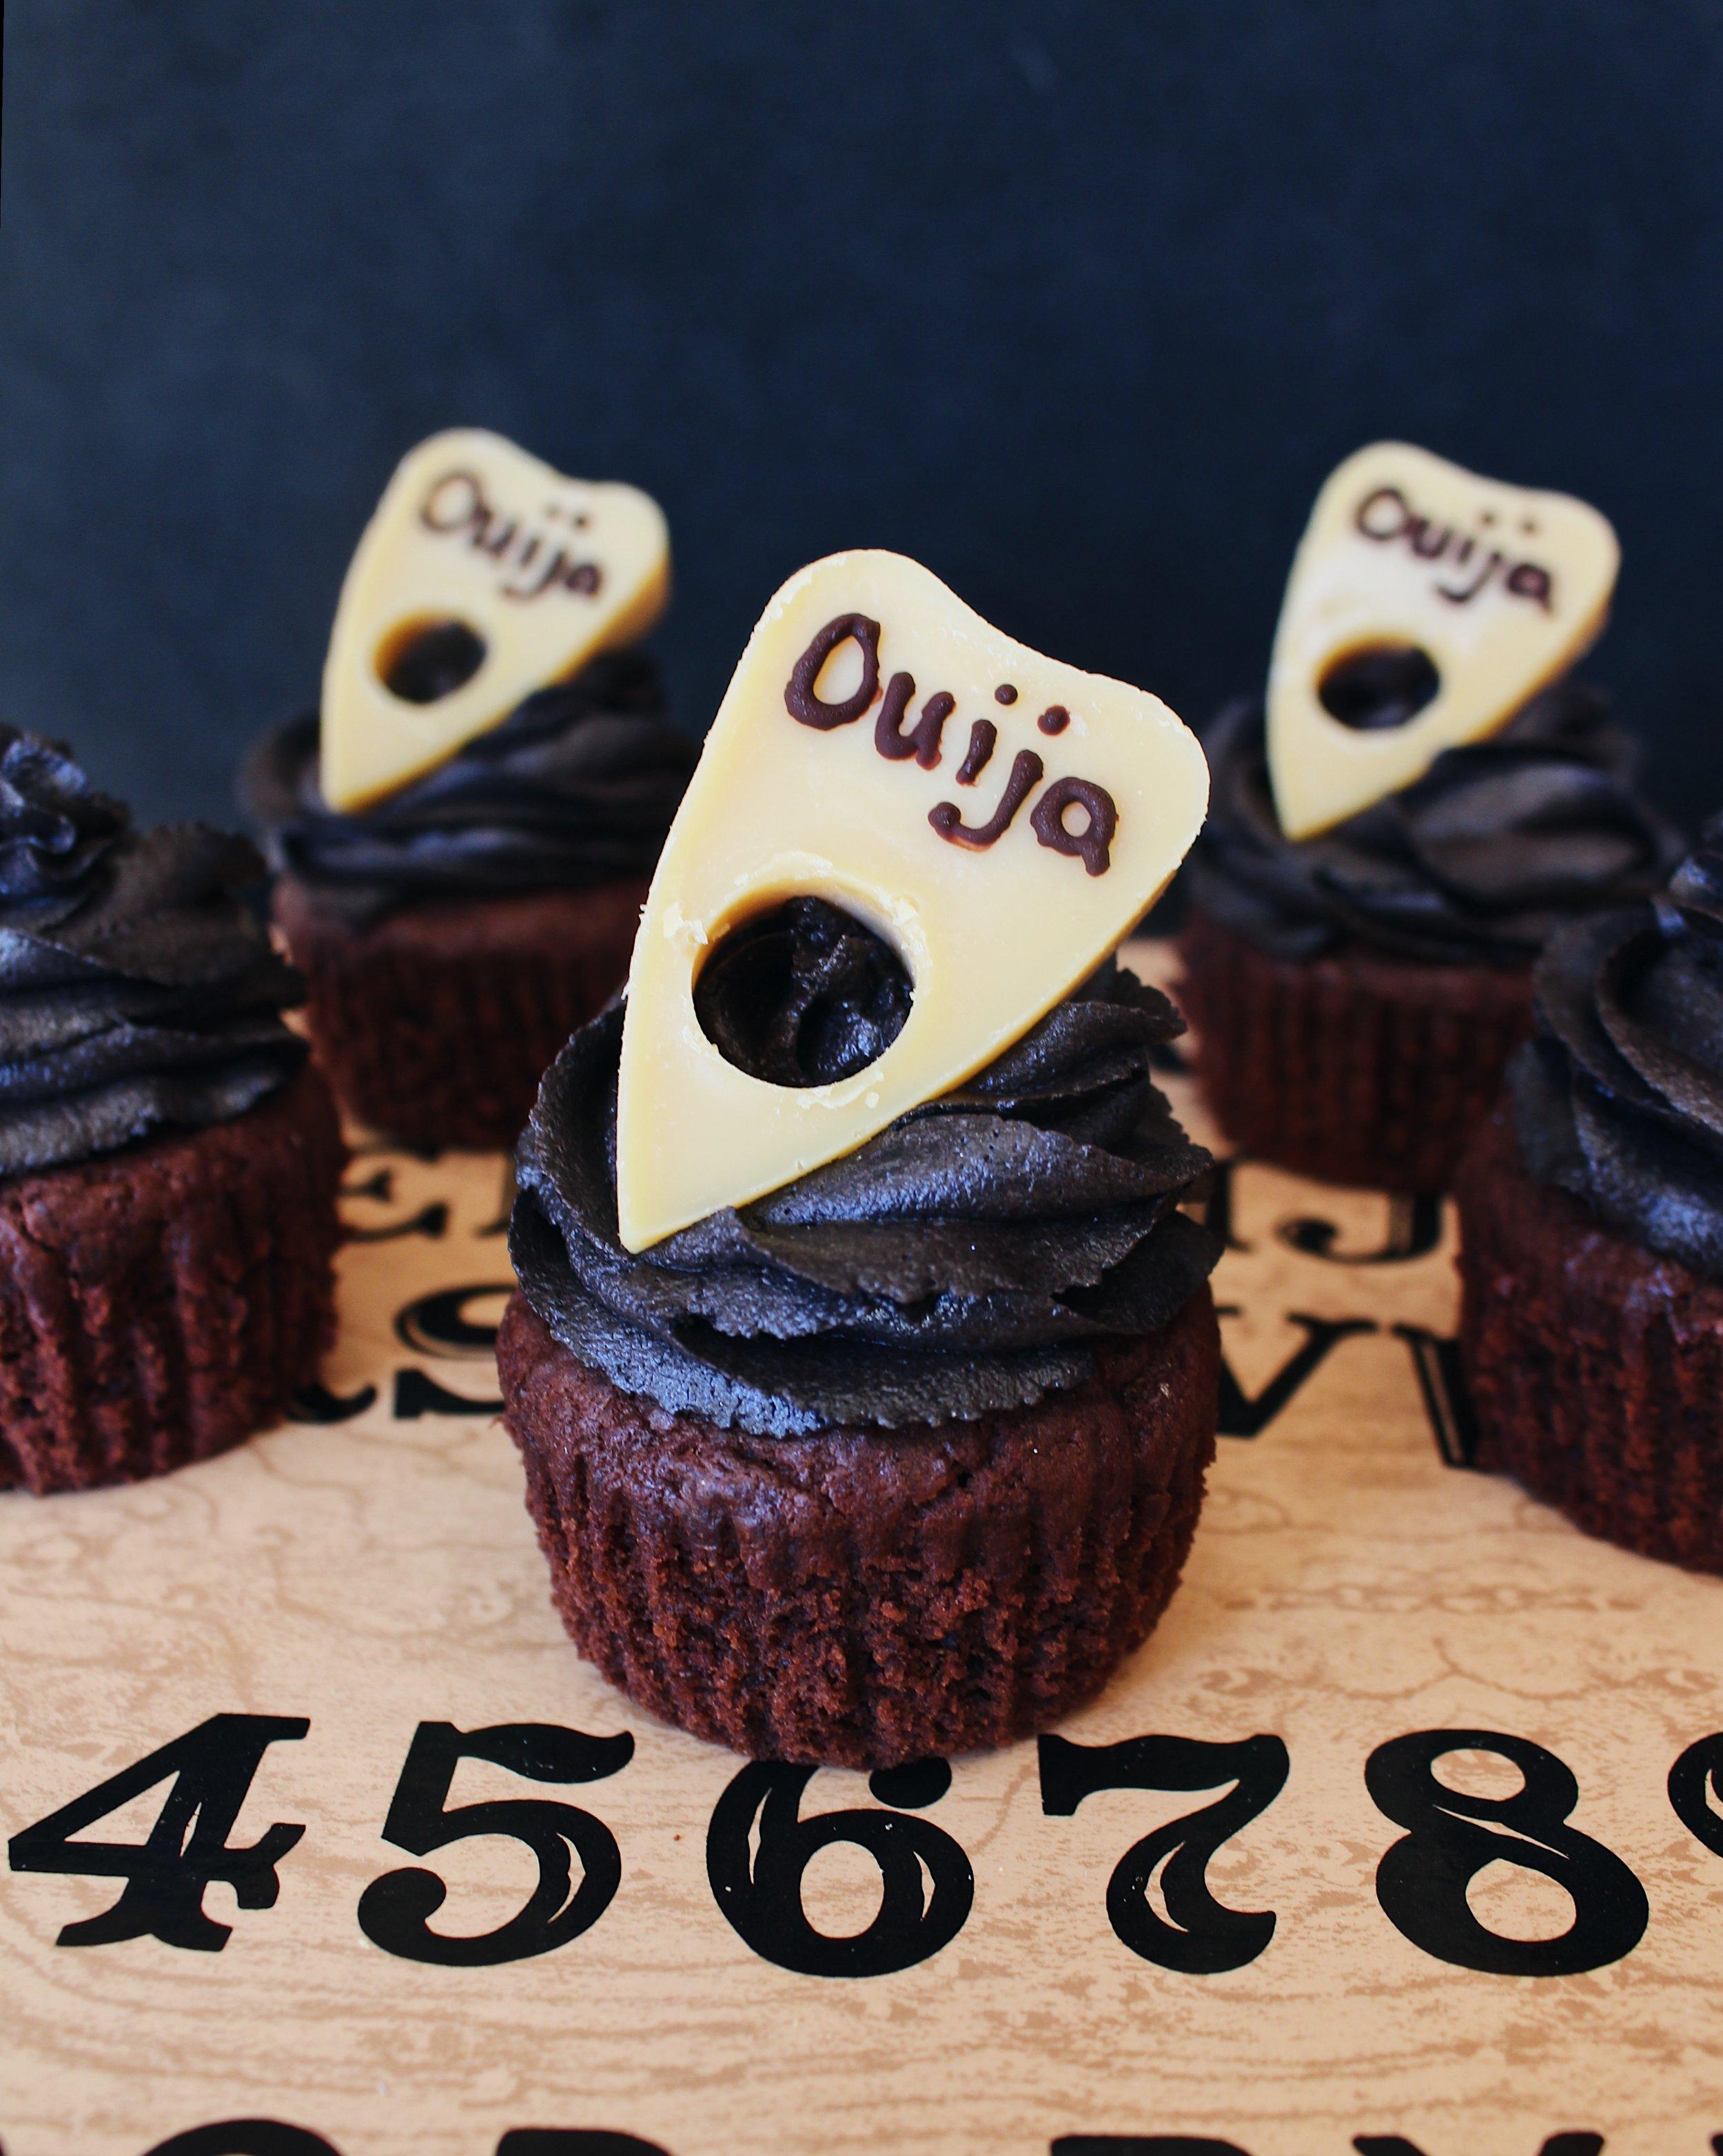 ouija board cupcakes.JPG